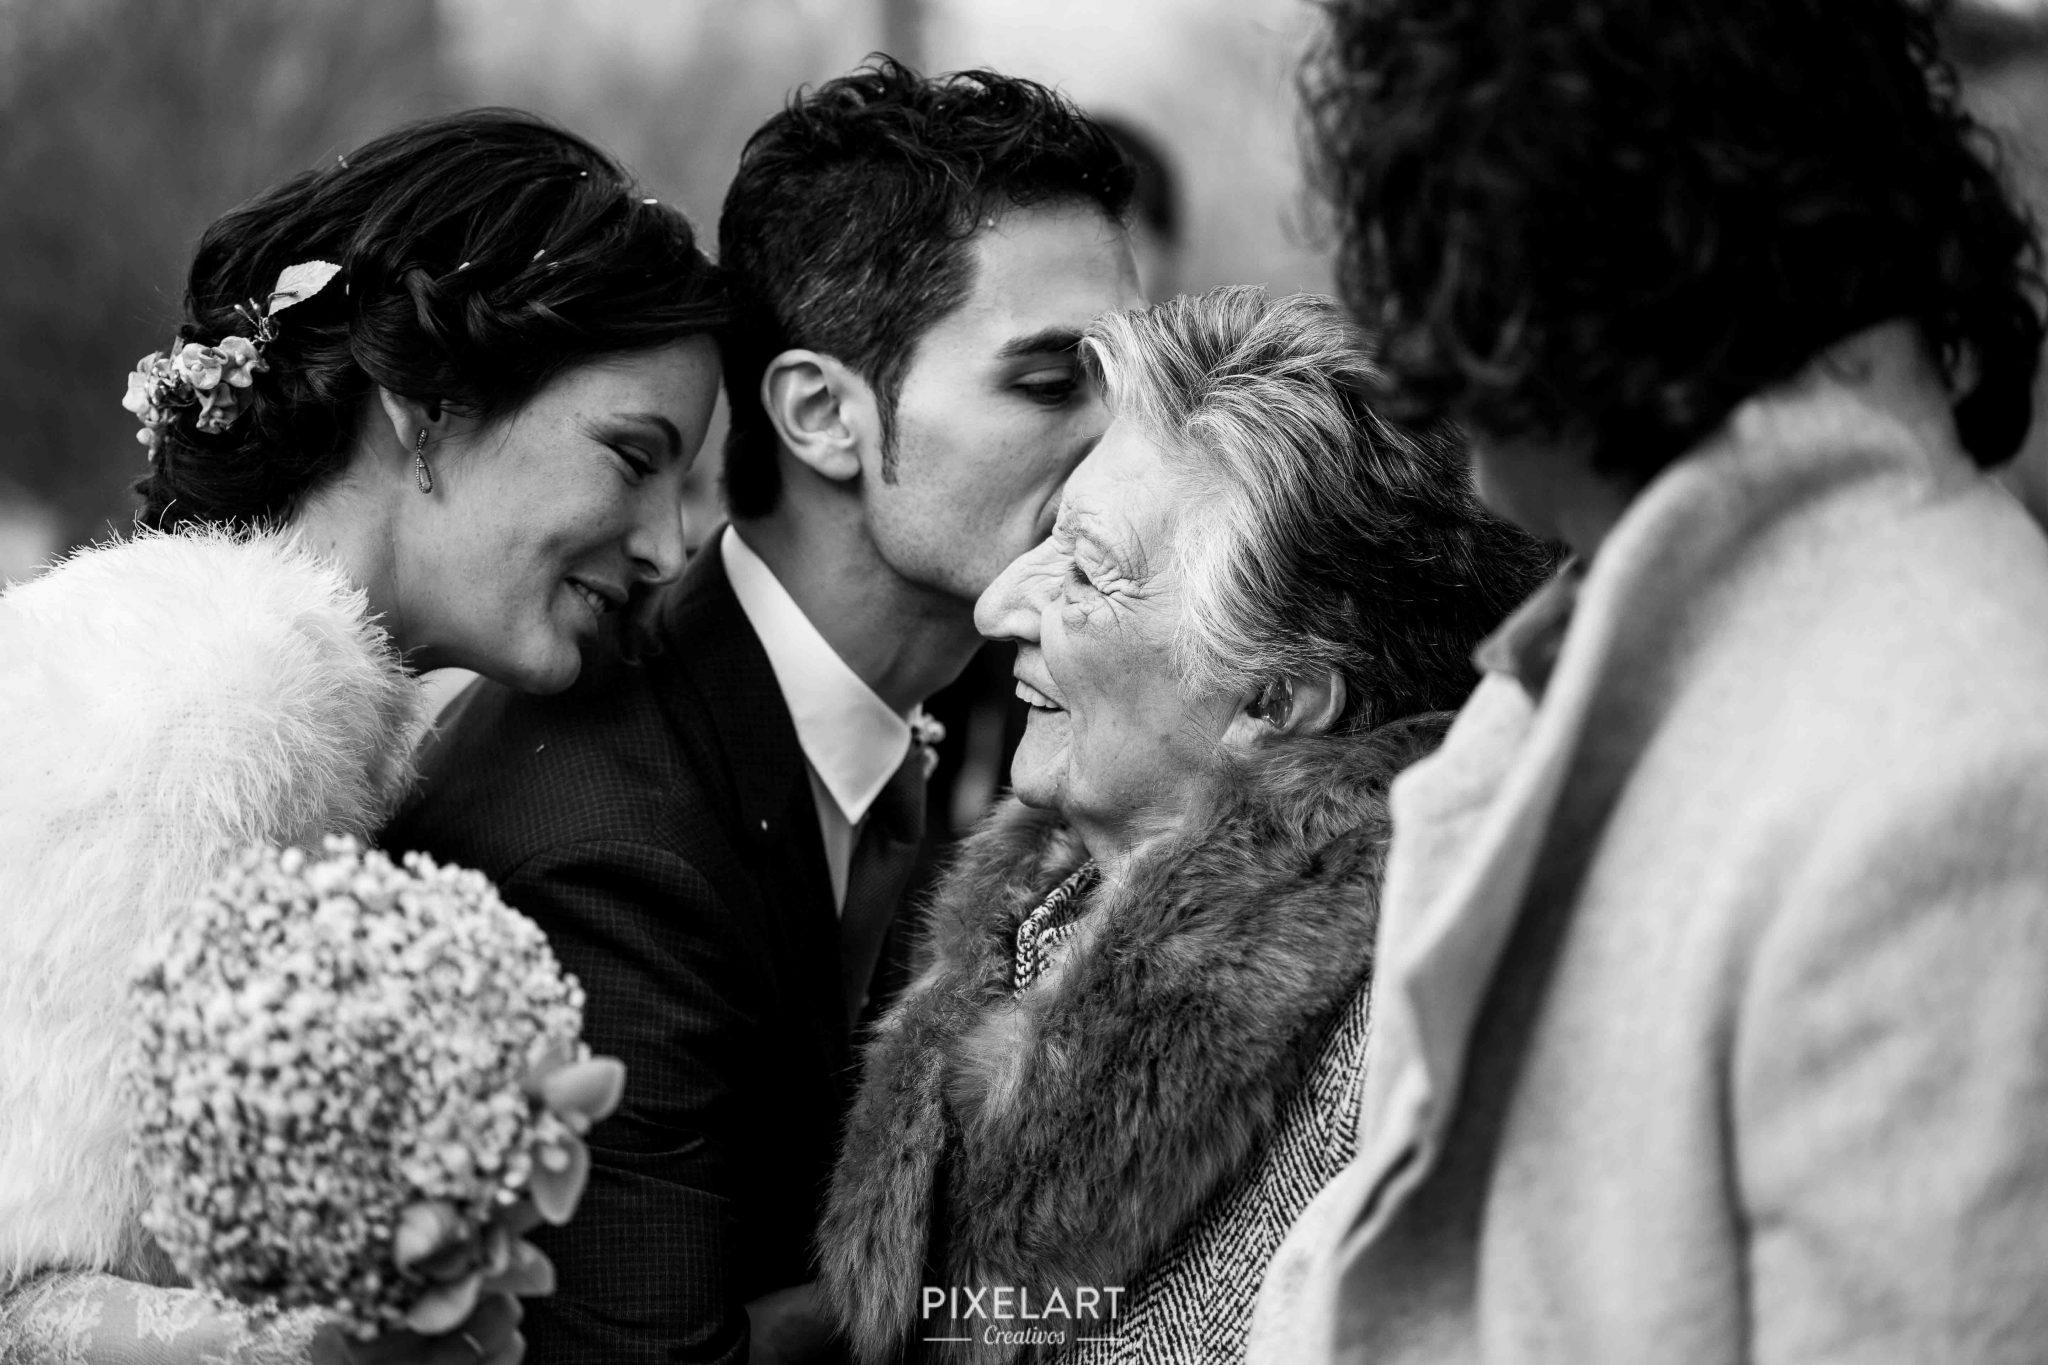 fotografía narrativa de boda